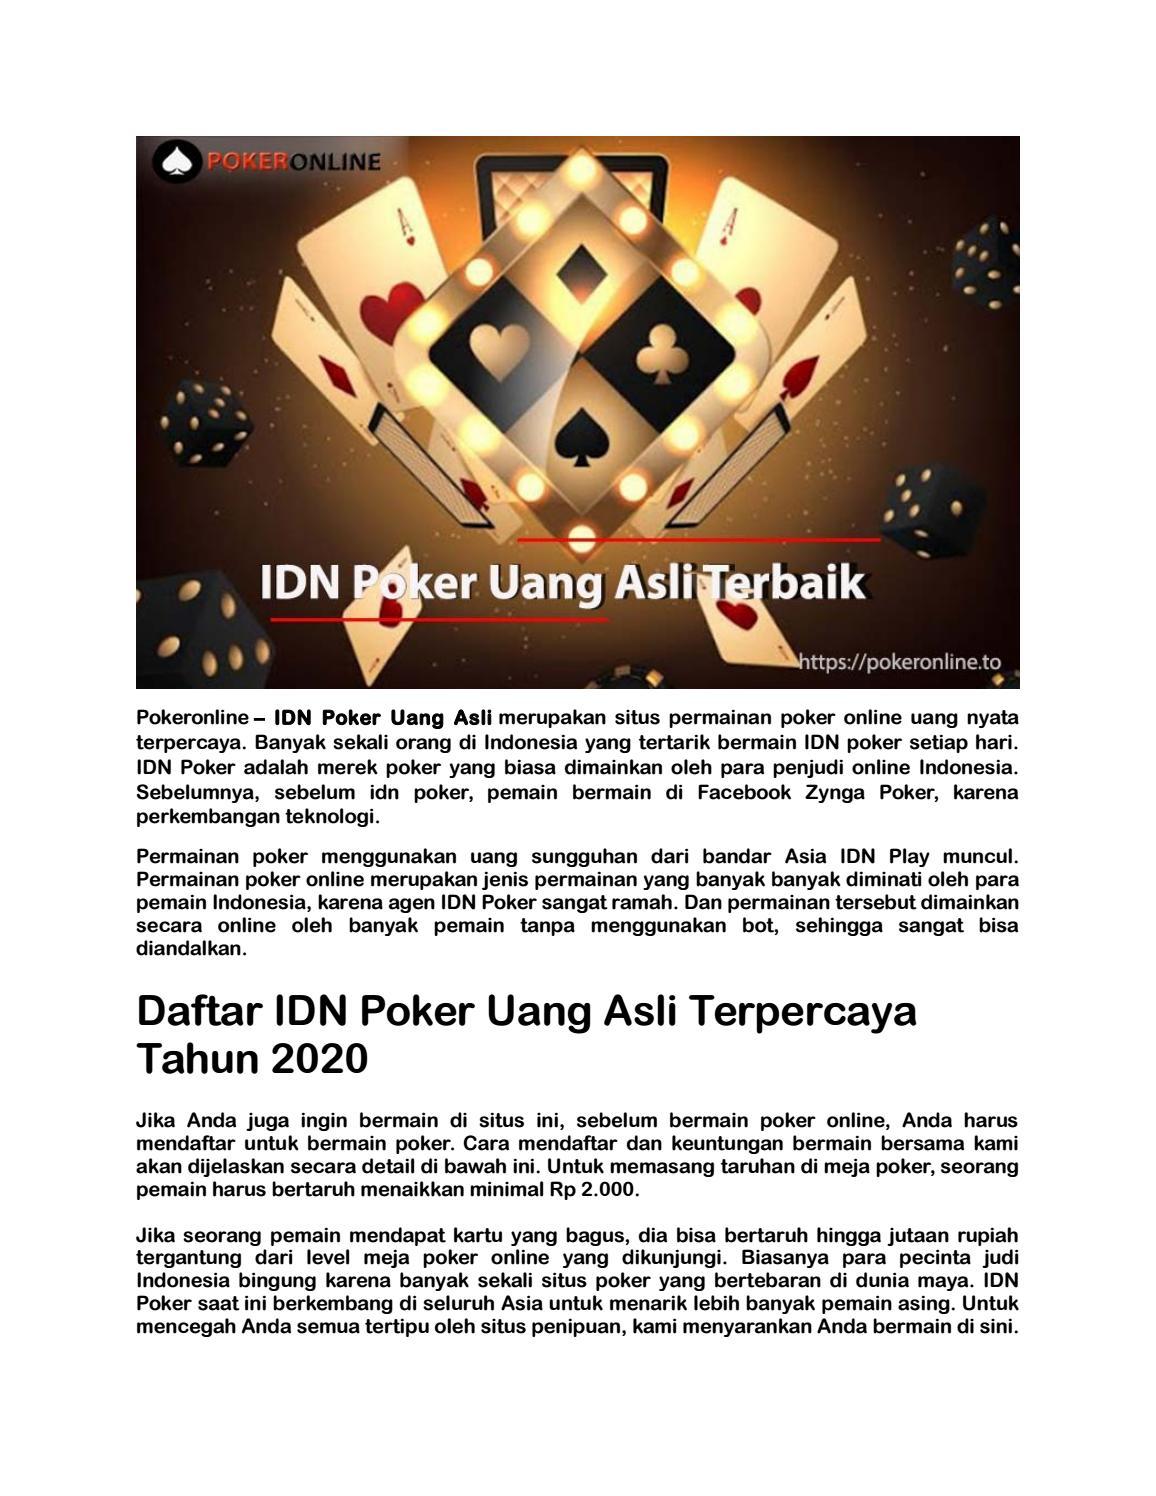 Idn Poker Uang Asli Terbaik Dan Terpercaya Diindonesia By Poker Online Issuu